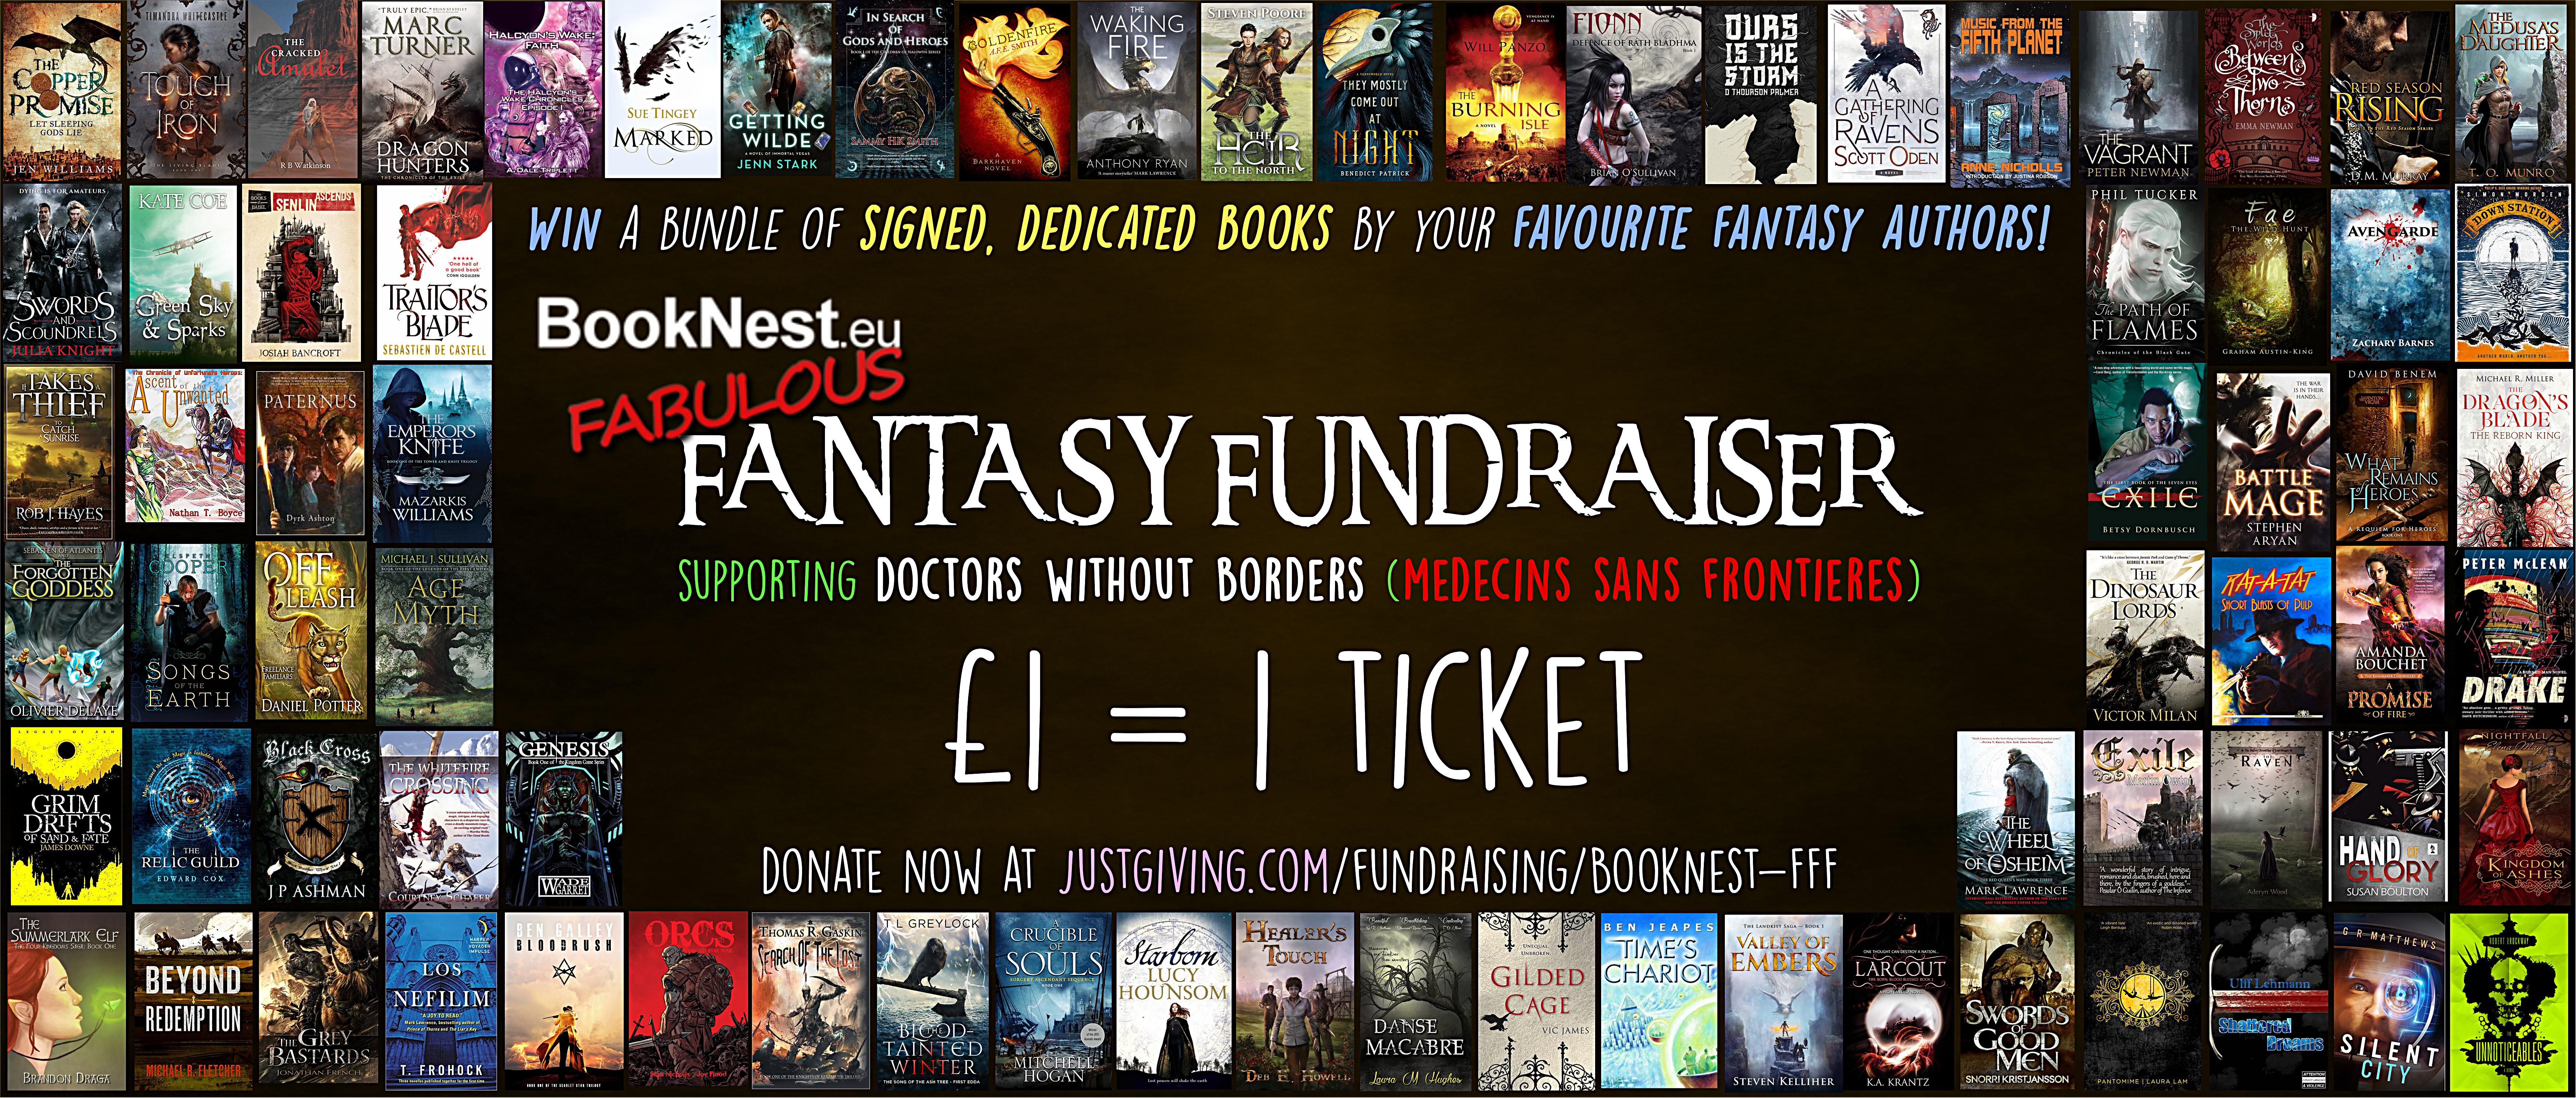 Booknest's Fabulous Fantasy Fundraiser